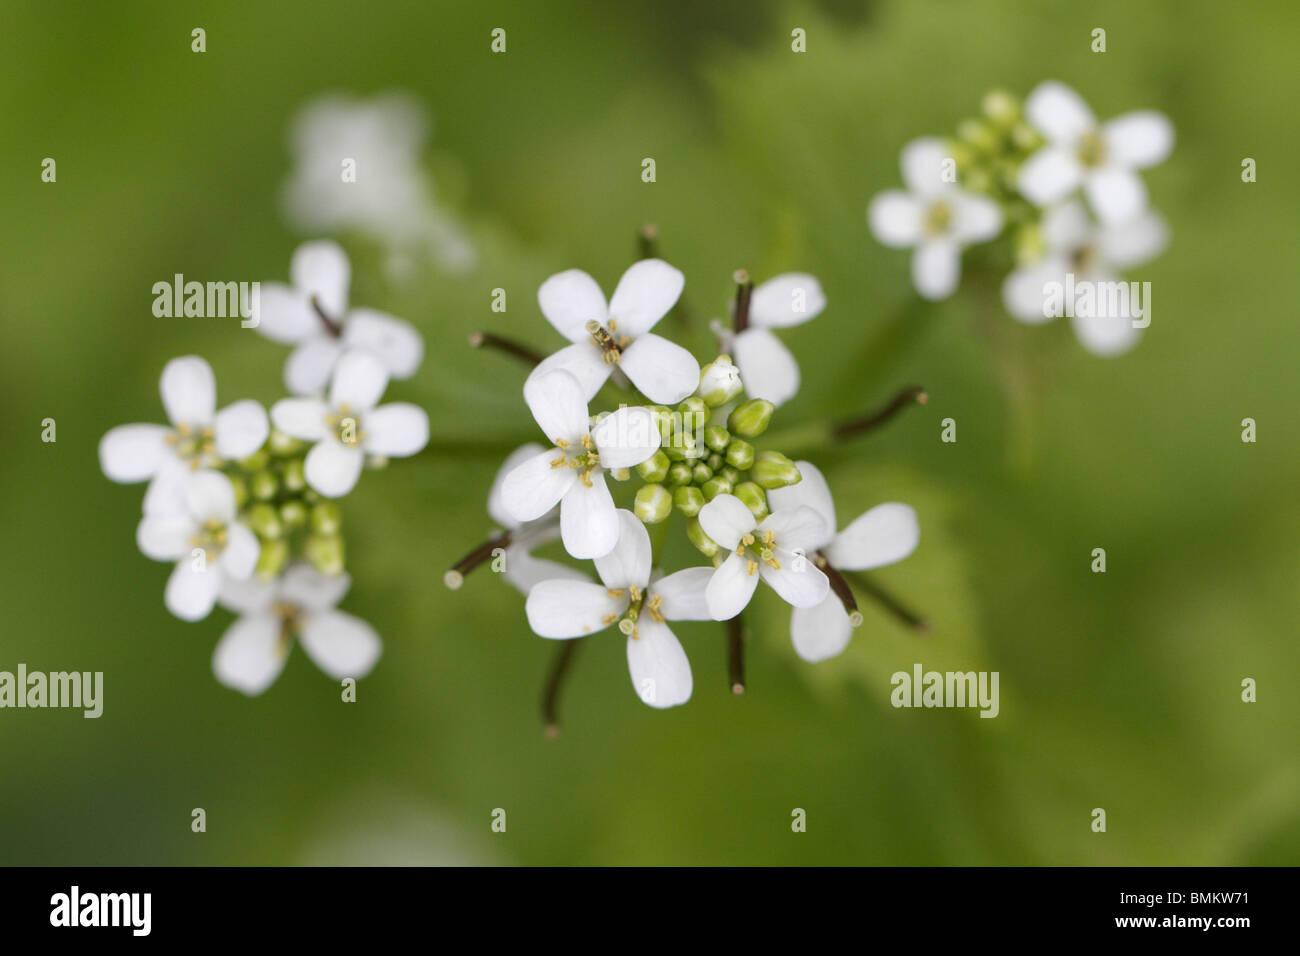 The inflorescence (flowers) of Alliaria petiolata, the Garlic mustard Stock Photo